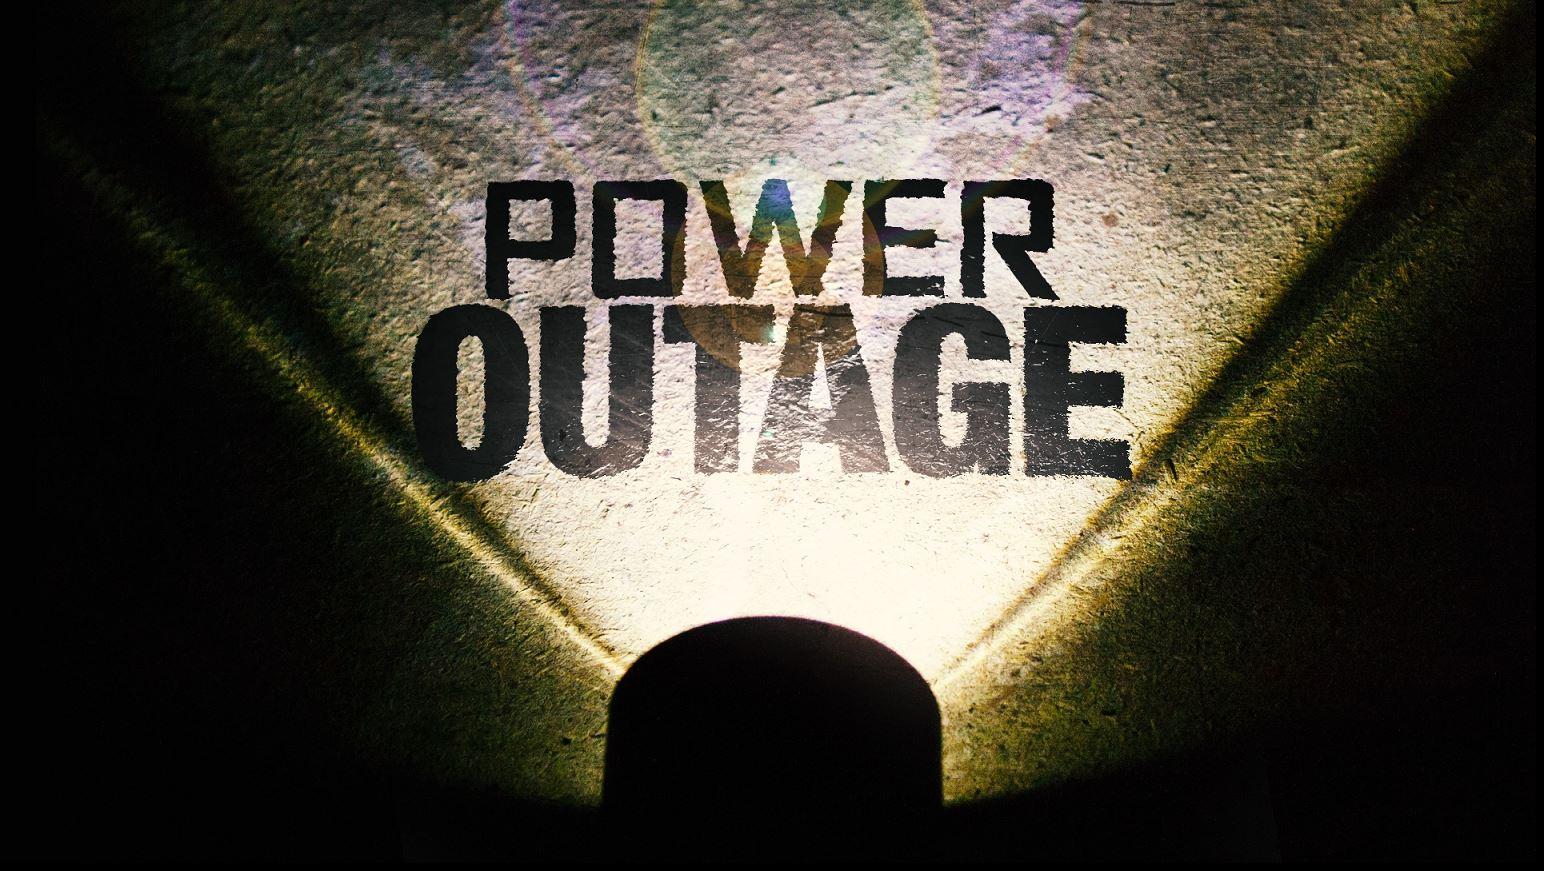 power outage_1536847478770.JPG.jpg